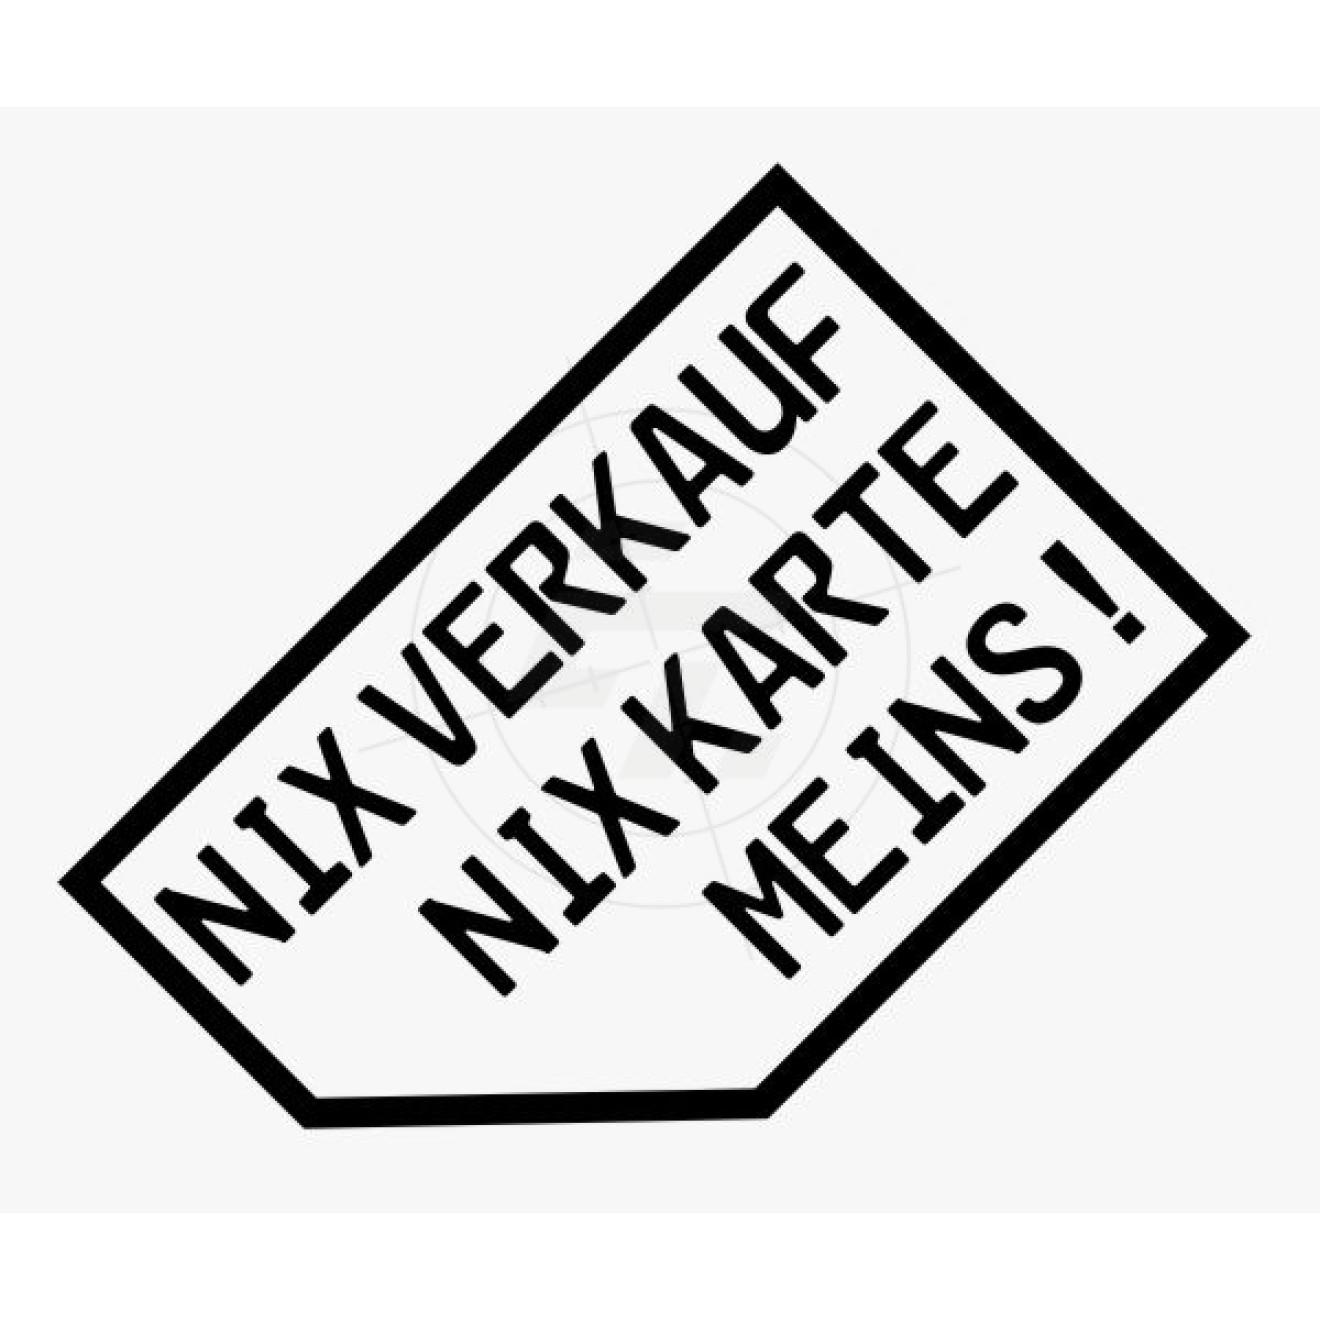 Aufkleber Nix Verkauf Nix Karte Meins